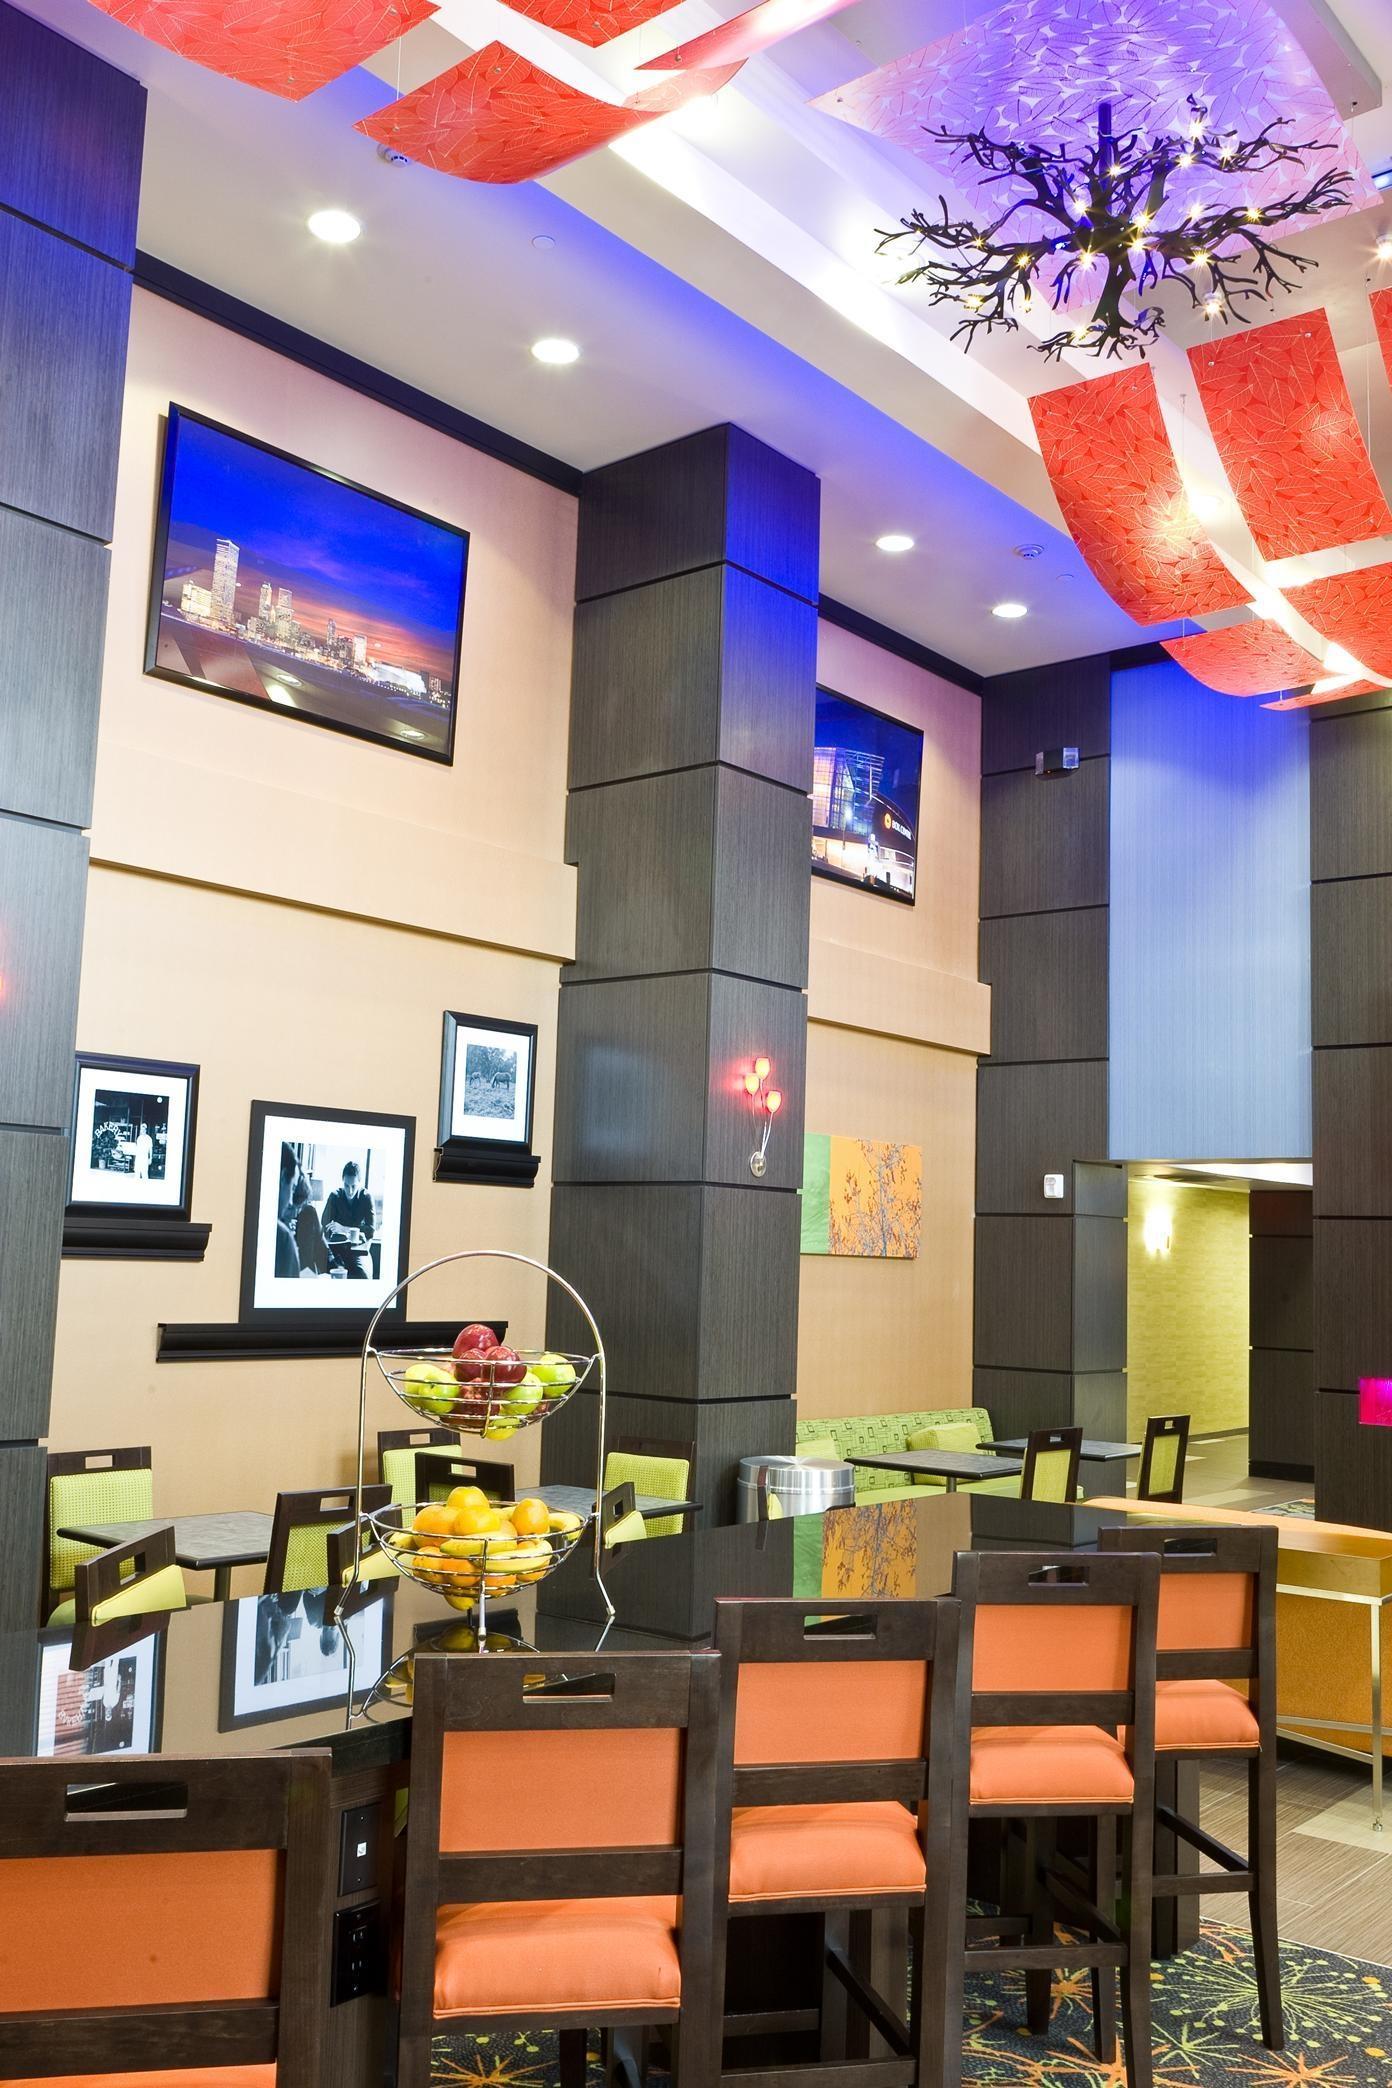 Hampton Inn & Suites Tulsa/Central image 15